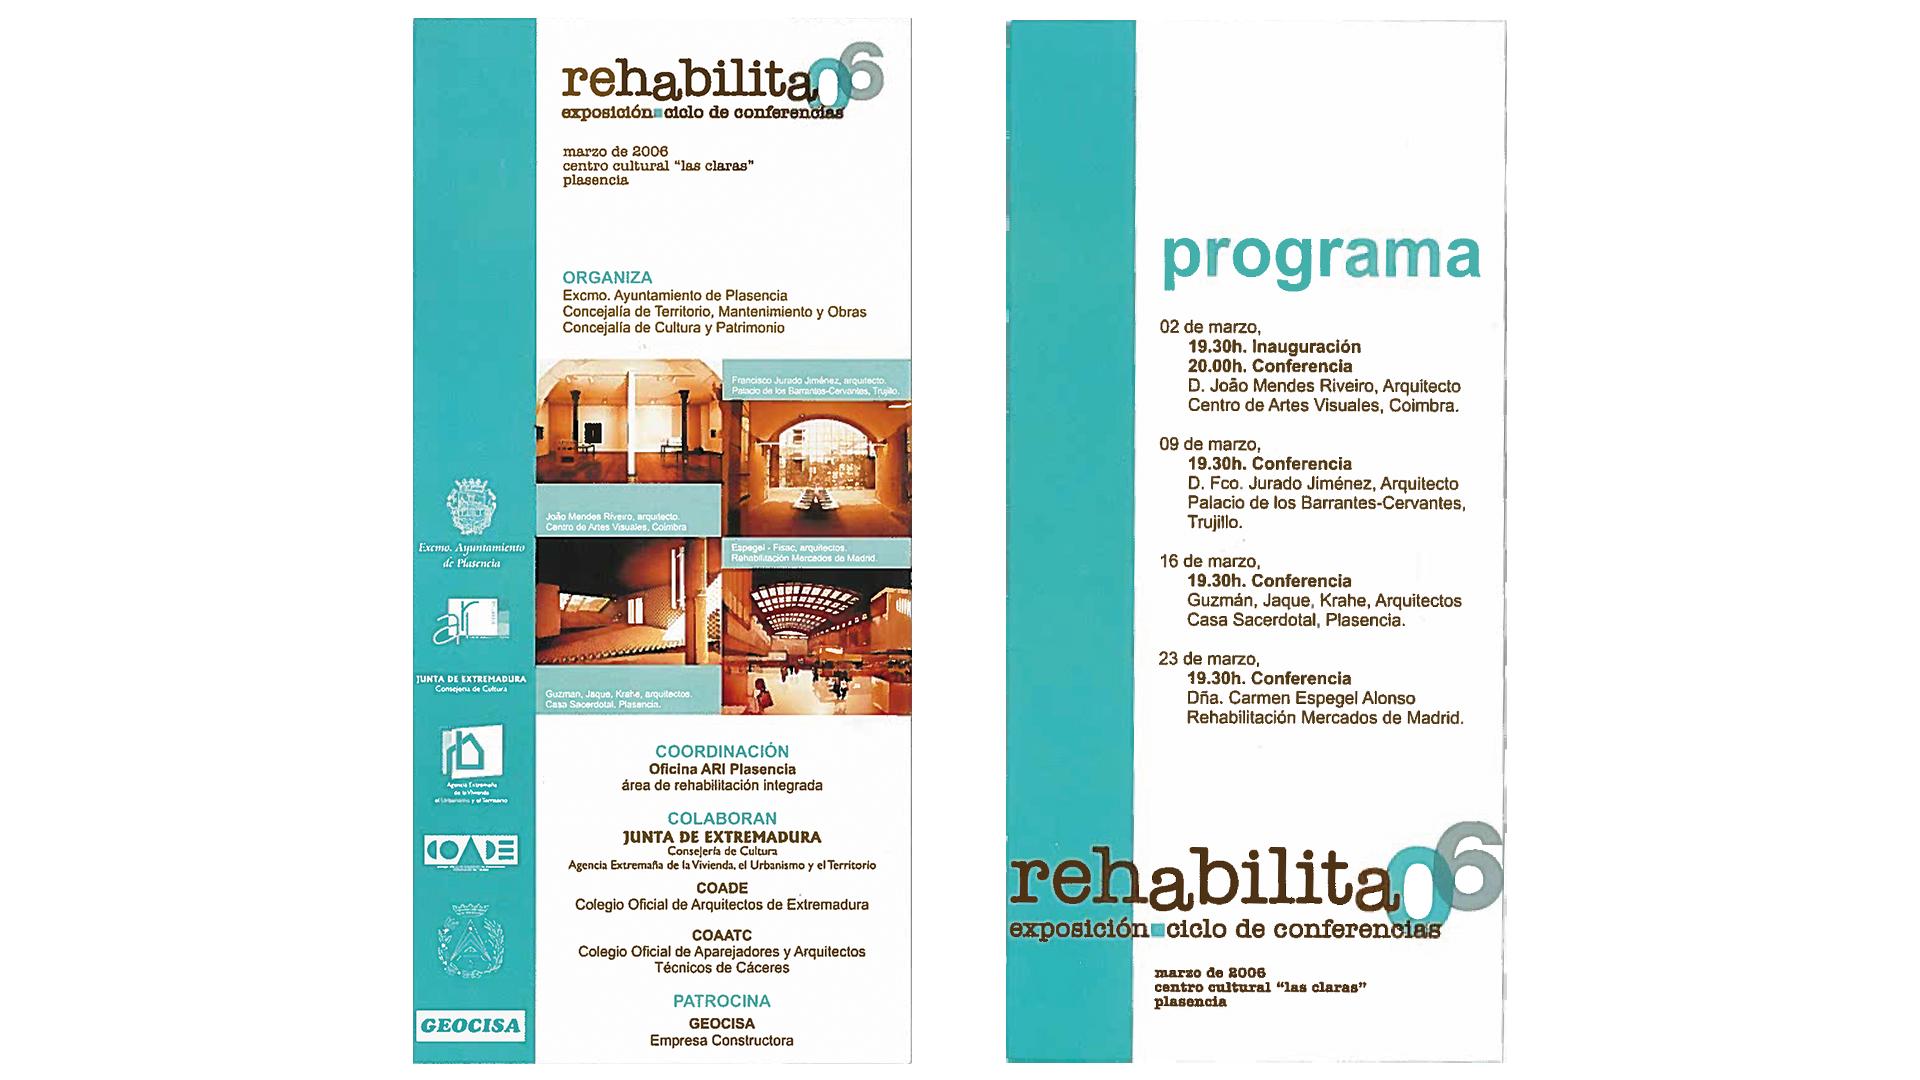 programa rehabilita 2006 plasencia